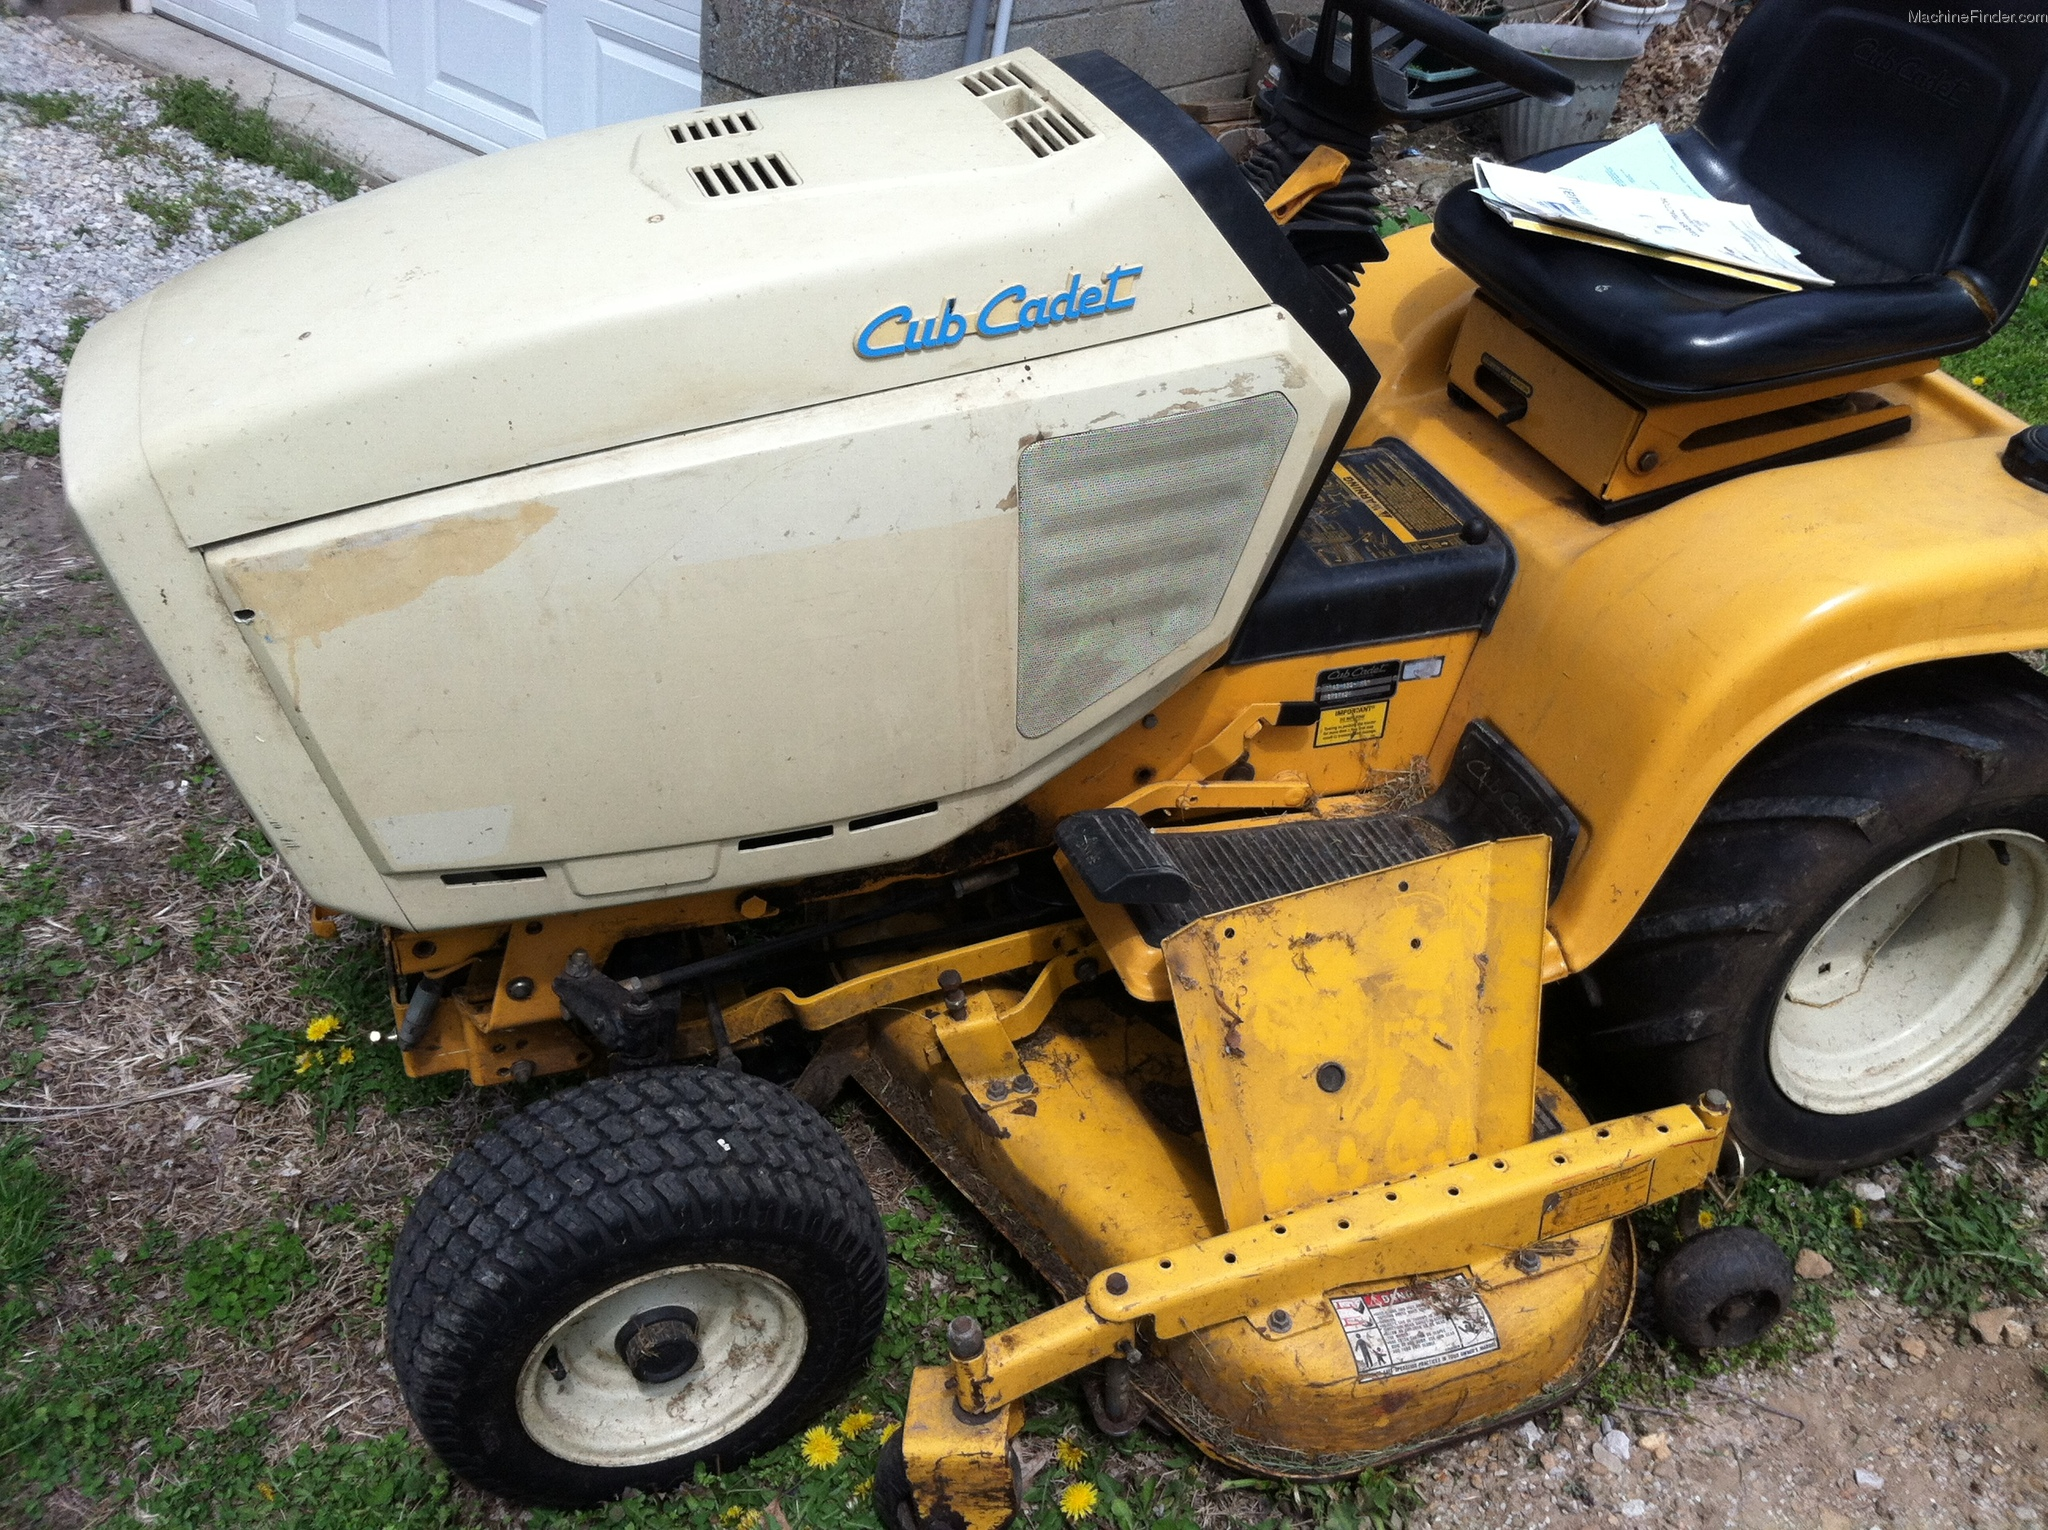 Cub Cadet 1600 Lawn Tractor Tractors Lt1018 Wiring Diagram 1995 1641 Garden And Commercial Mowing John Deere